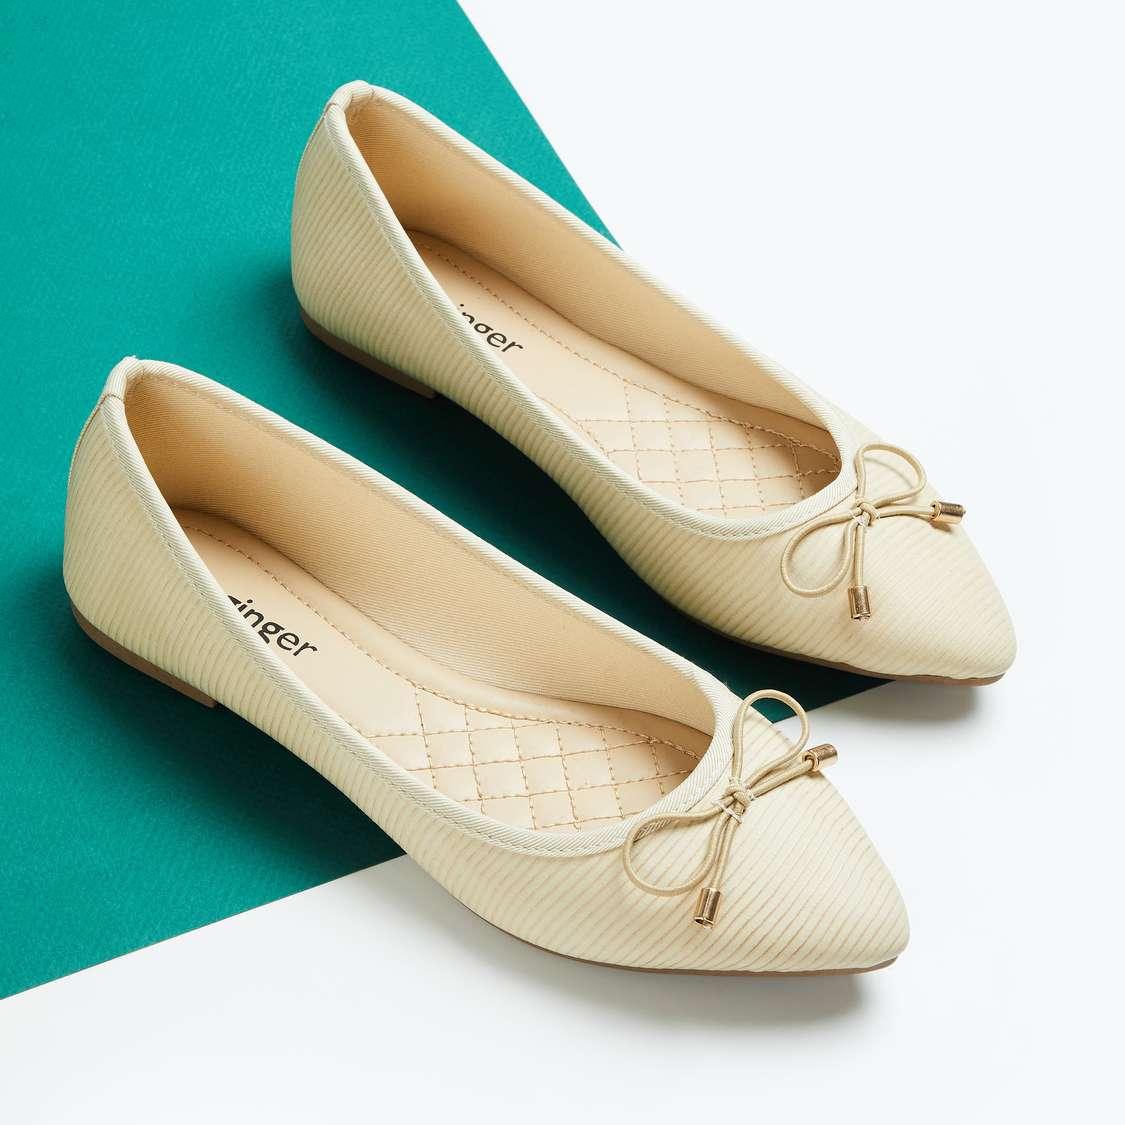 Women Textured Pointed Toe Ballerinas